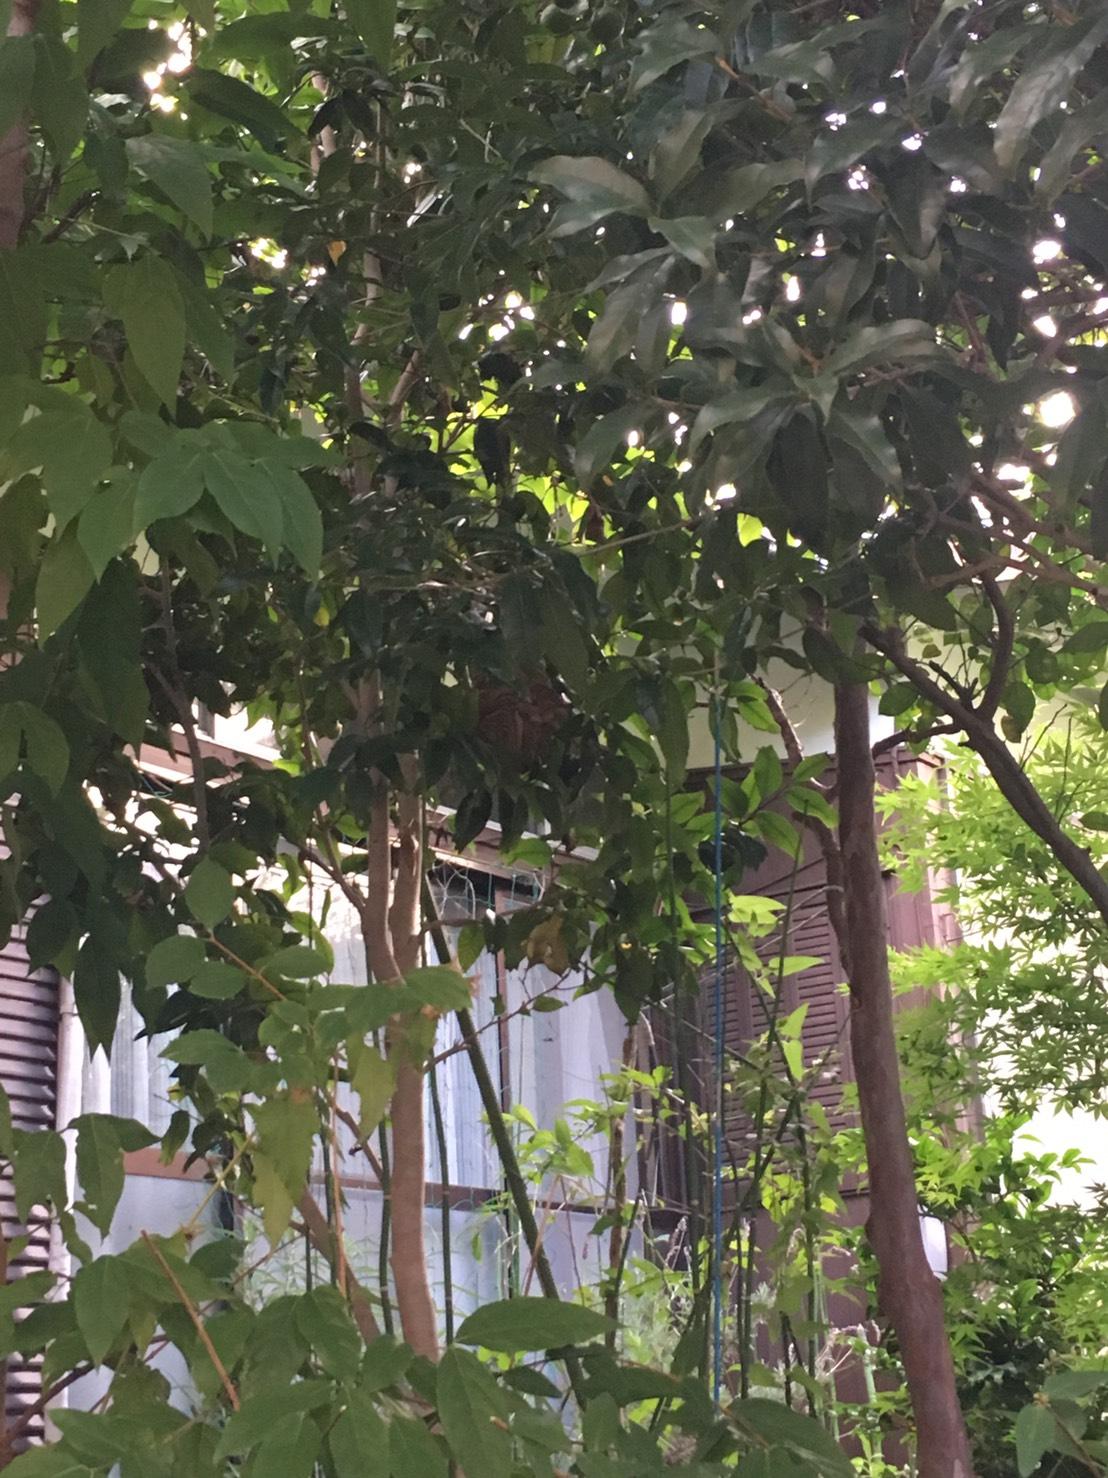 千葉県柏市加賀の蜂の巣駆除現場